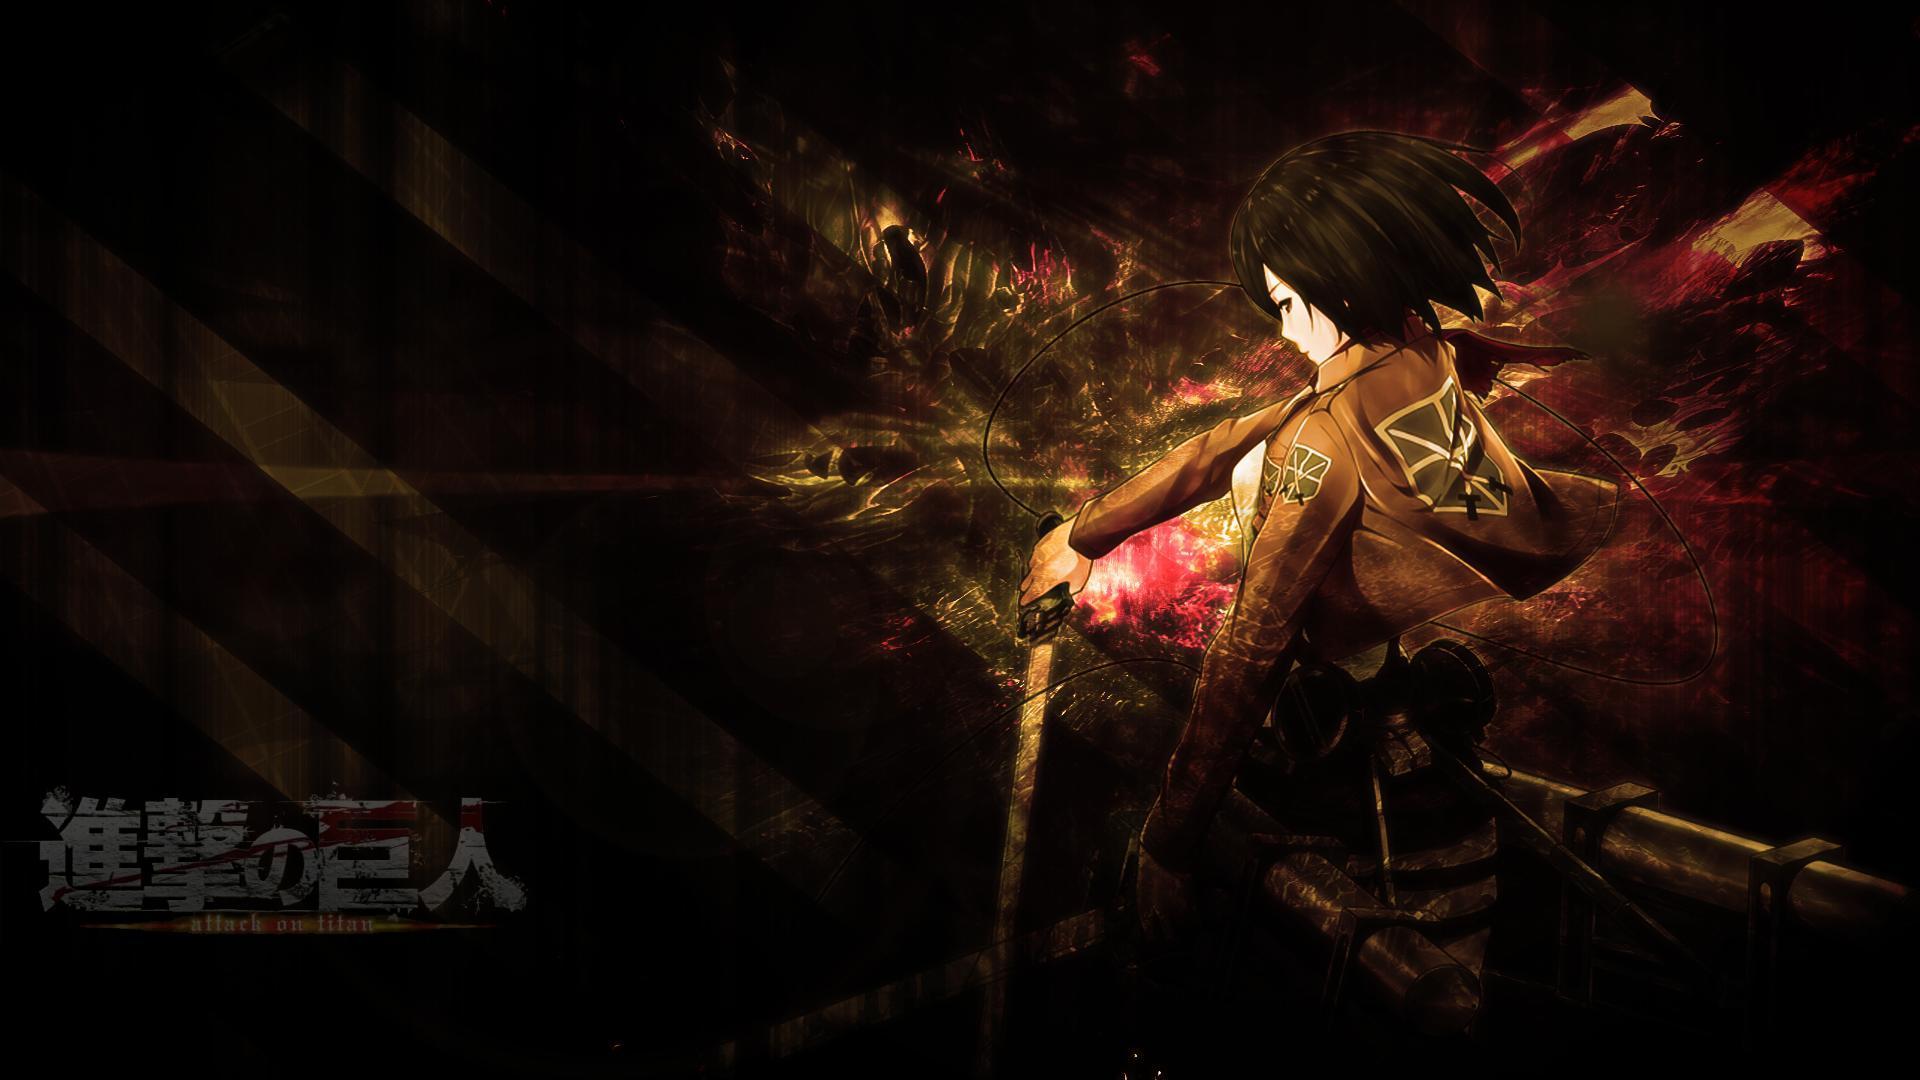 Attack on titans 1080p 2k 4k. Attack On Titan Logo Wallpapers - Wallpaper Cave